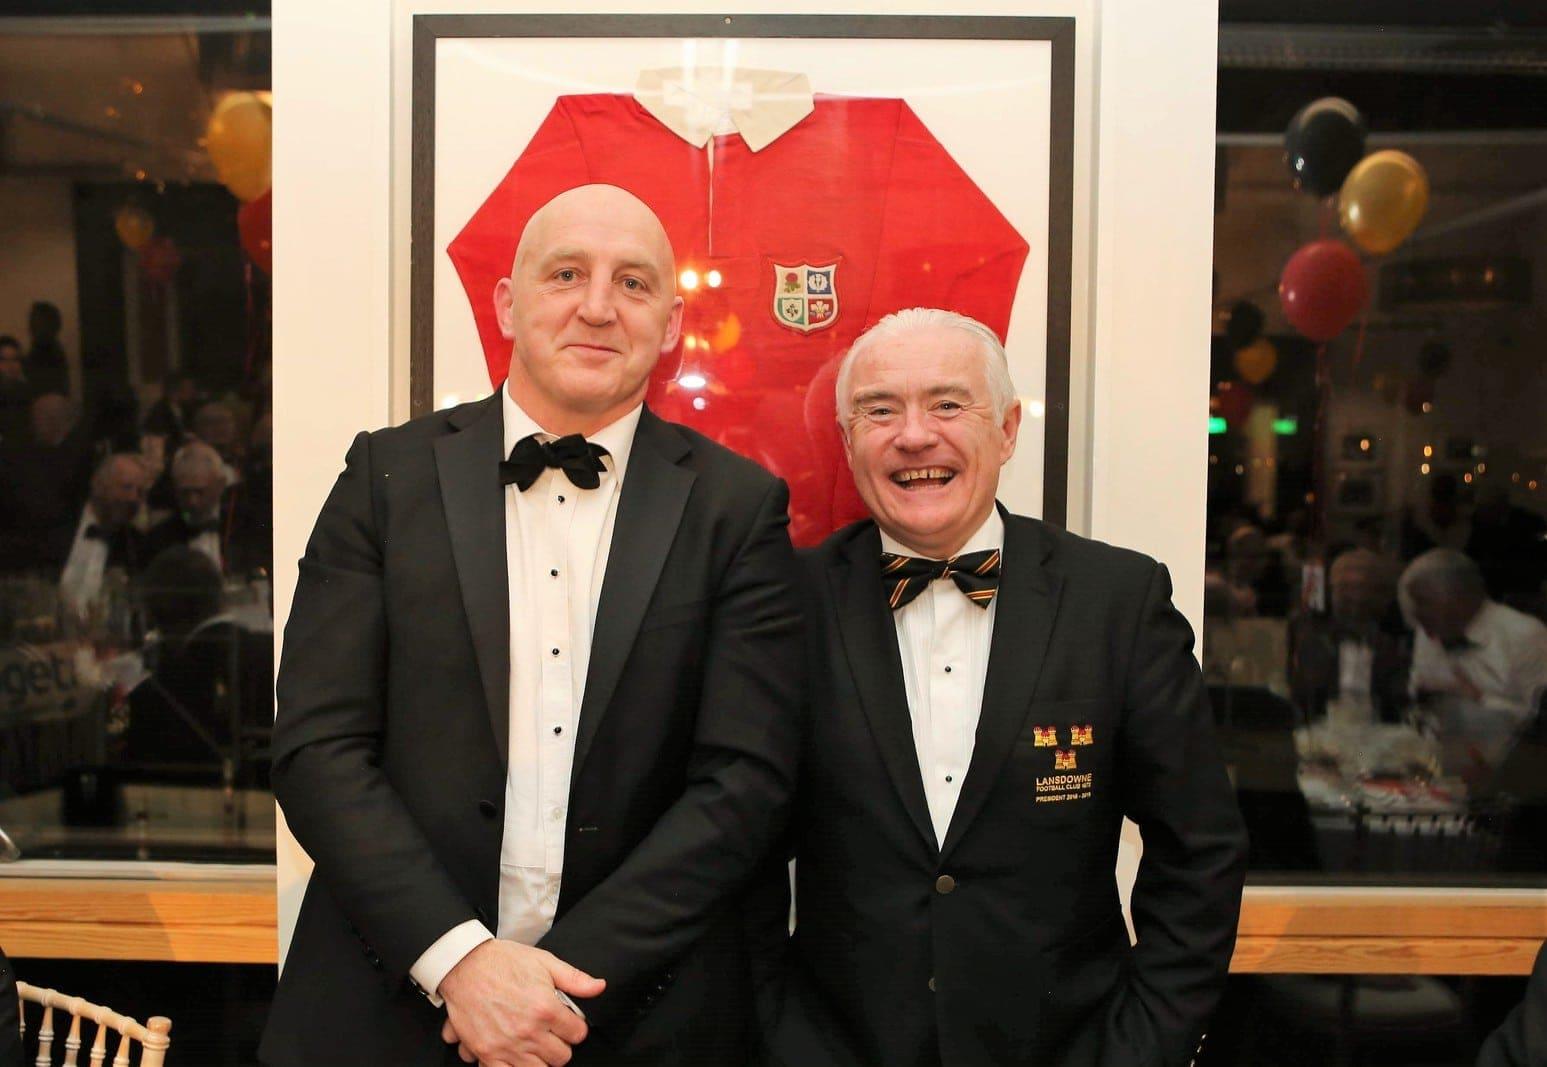 Keith Wood and Kieran Mulligan President's Dinner 2019